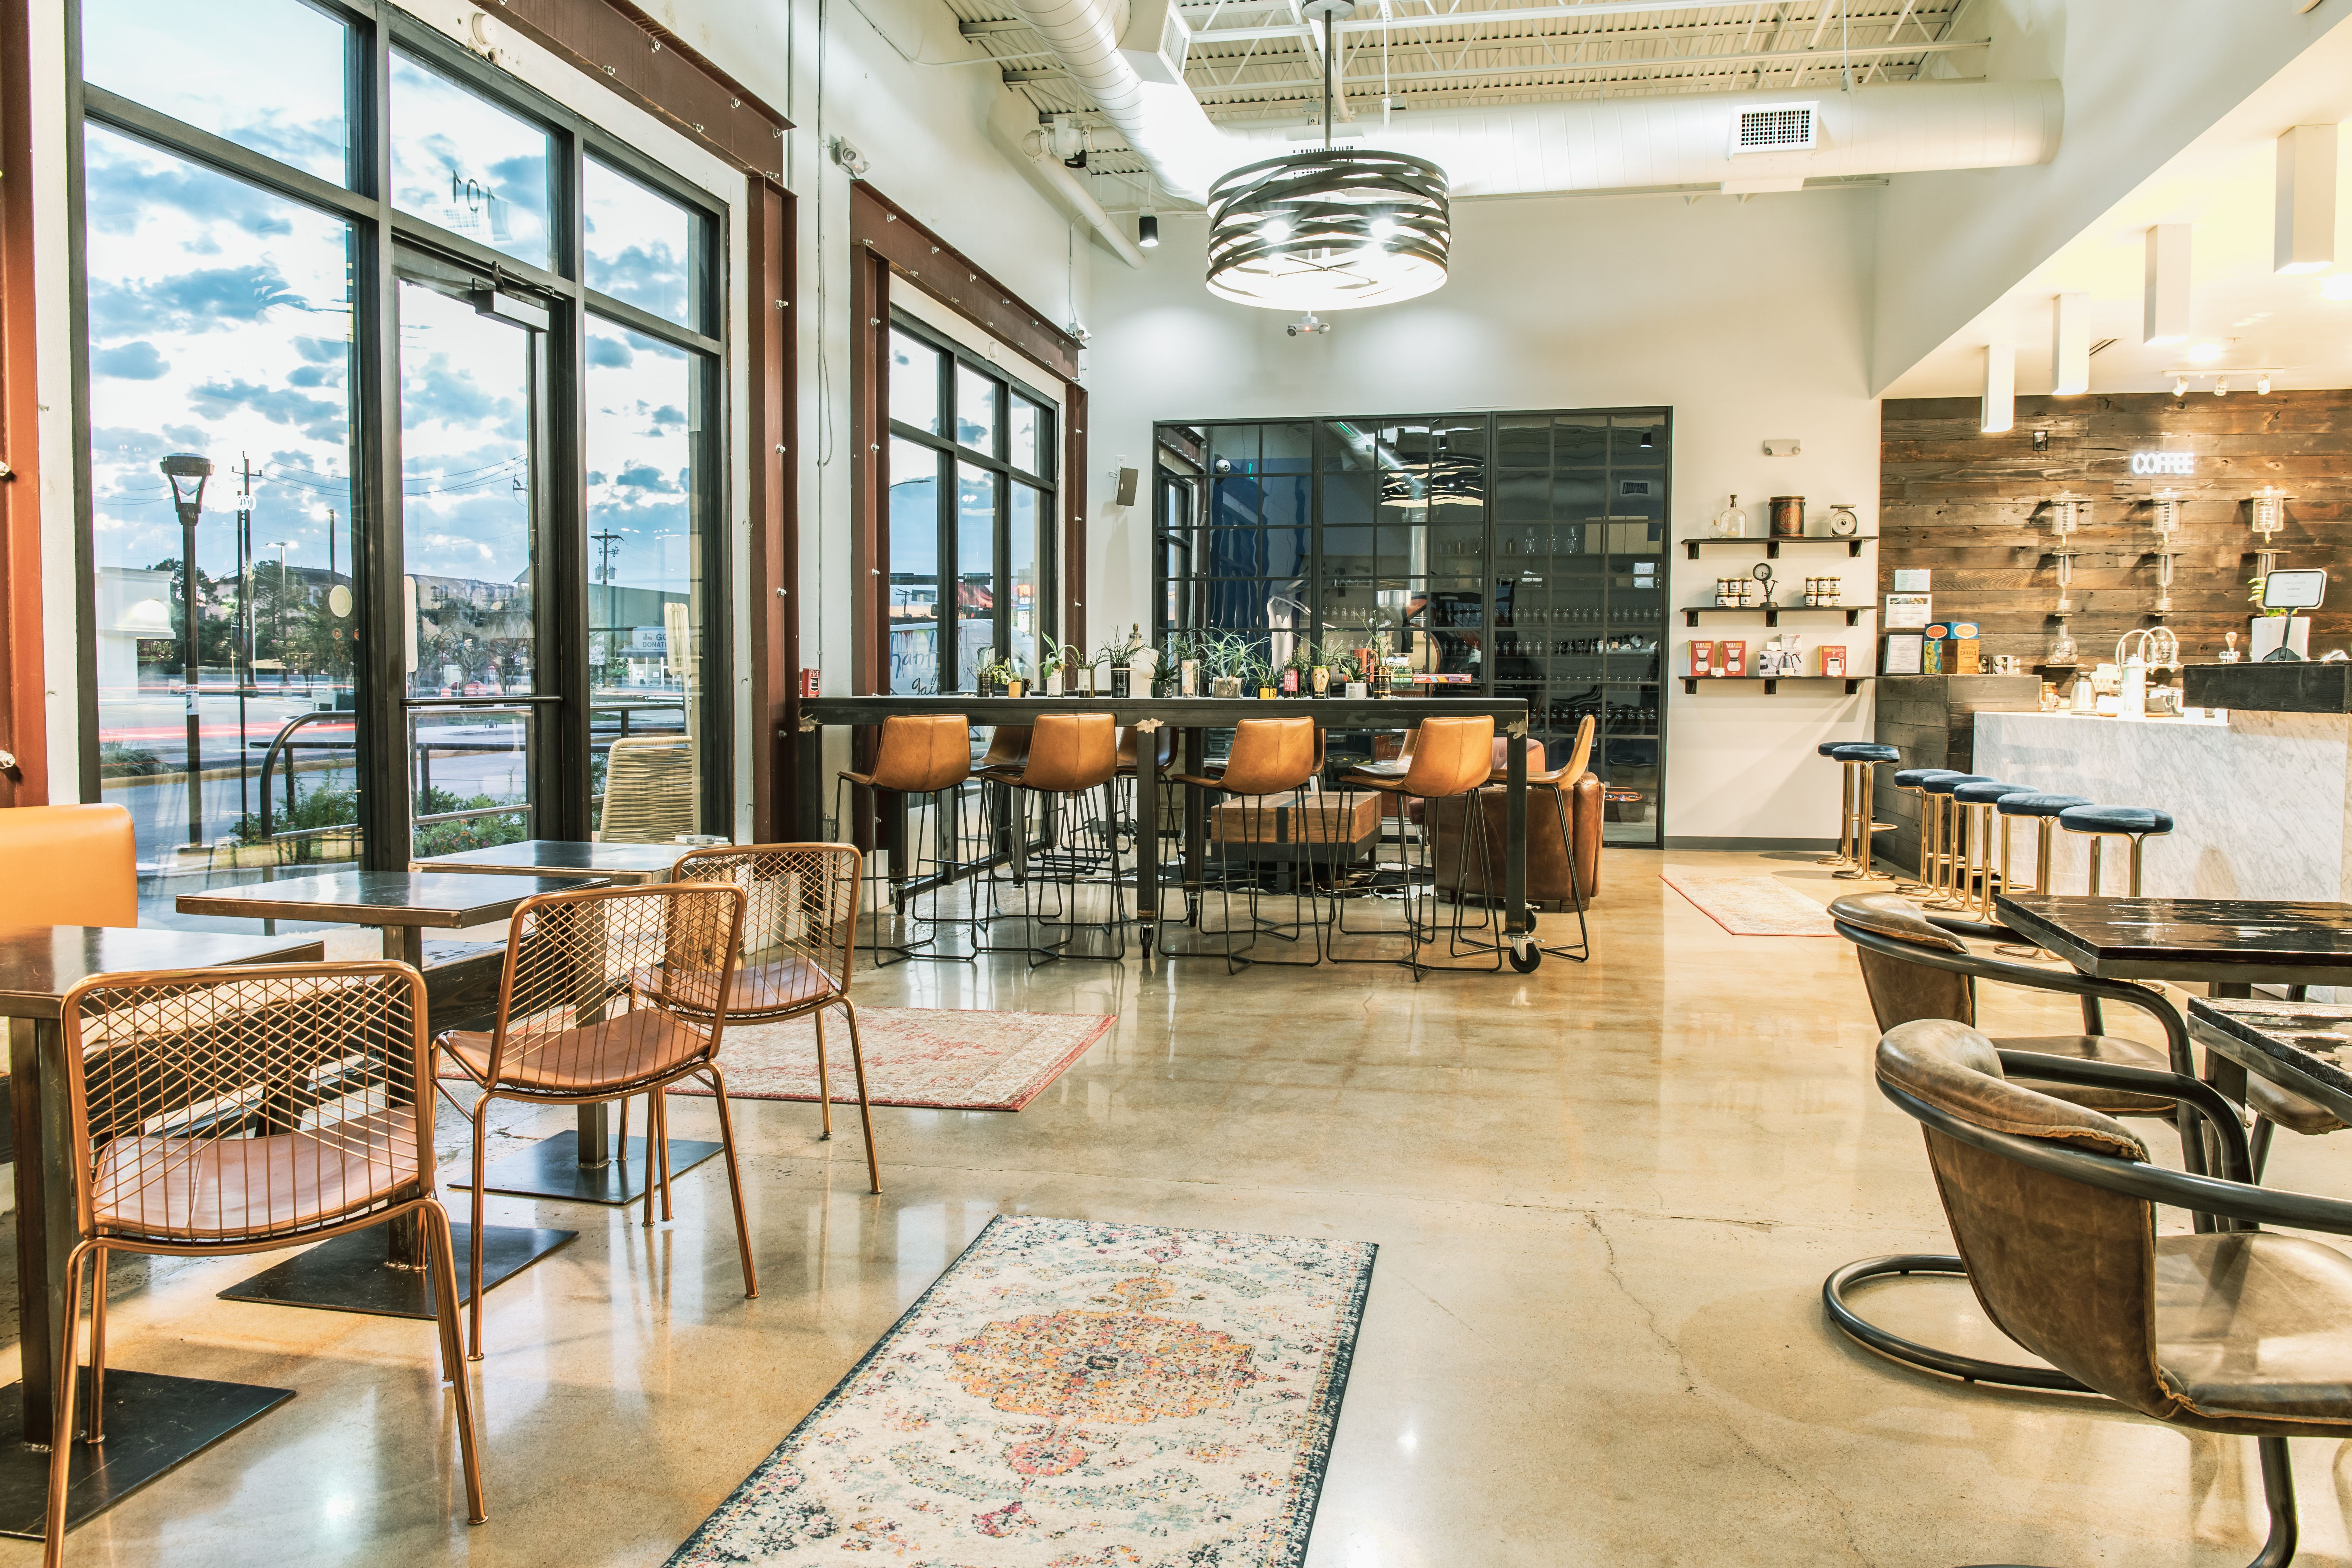 Cavo coffee houston in 2020 interior coffee shop coffee